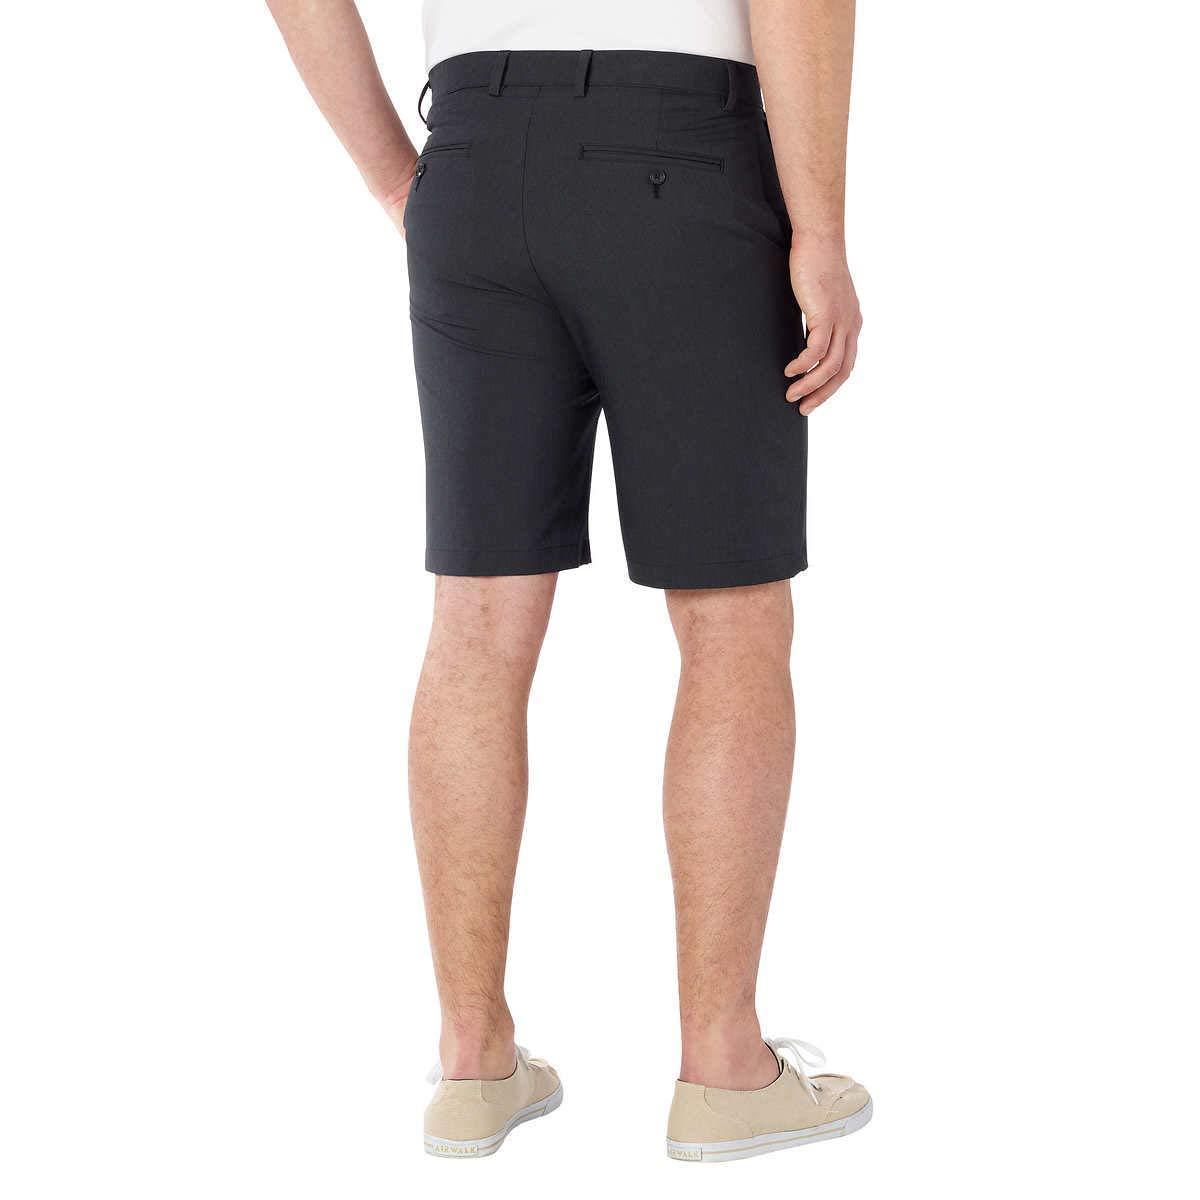 JiJingHeWang Birthday 36 Mens Casual Shorts Pants